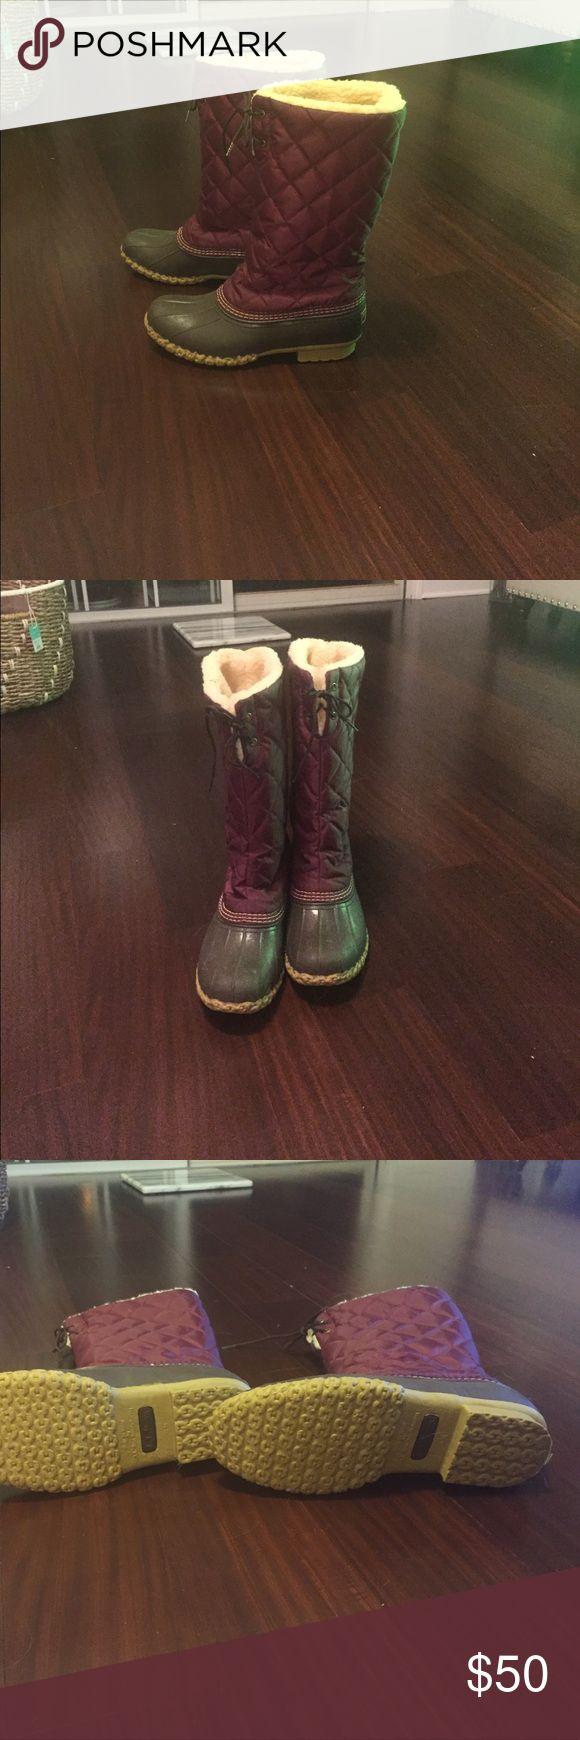 LL BEAN SNOW BOOT Size 10 LL Bean Shoes Winter & Rain Boots